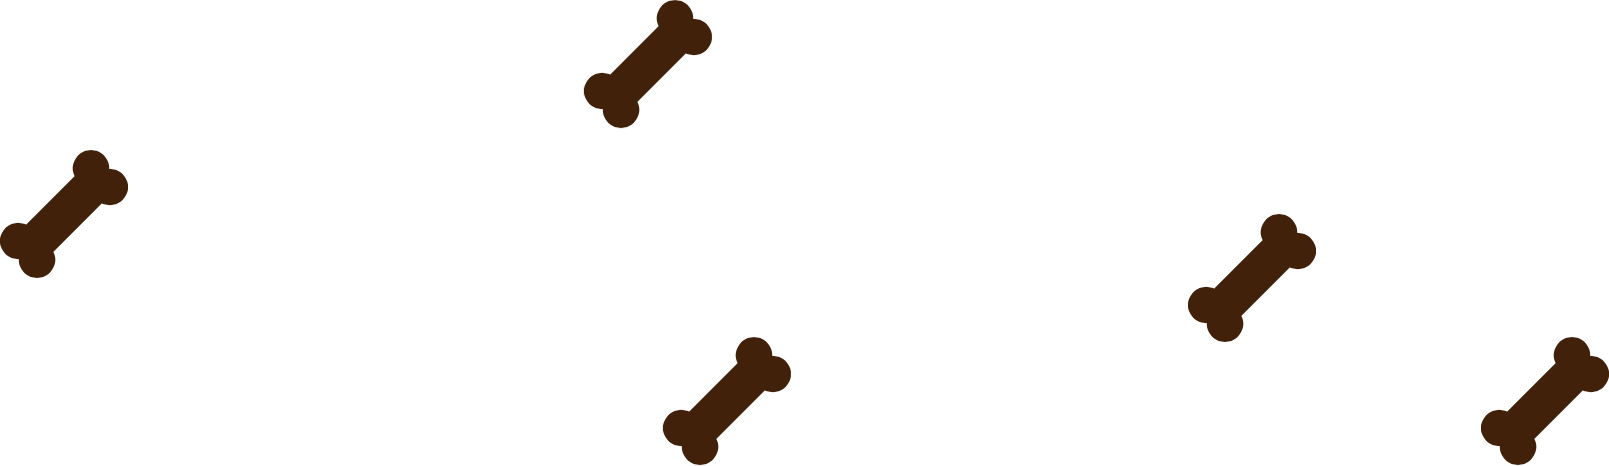 Group bones